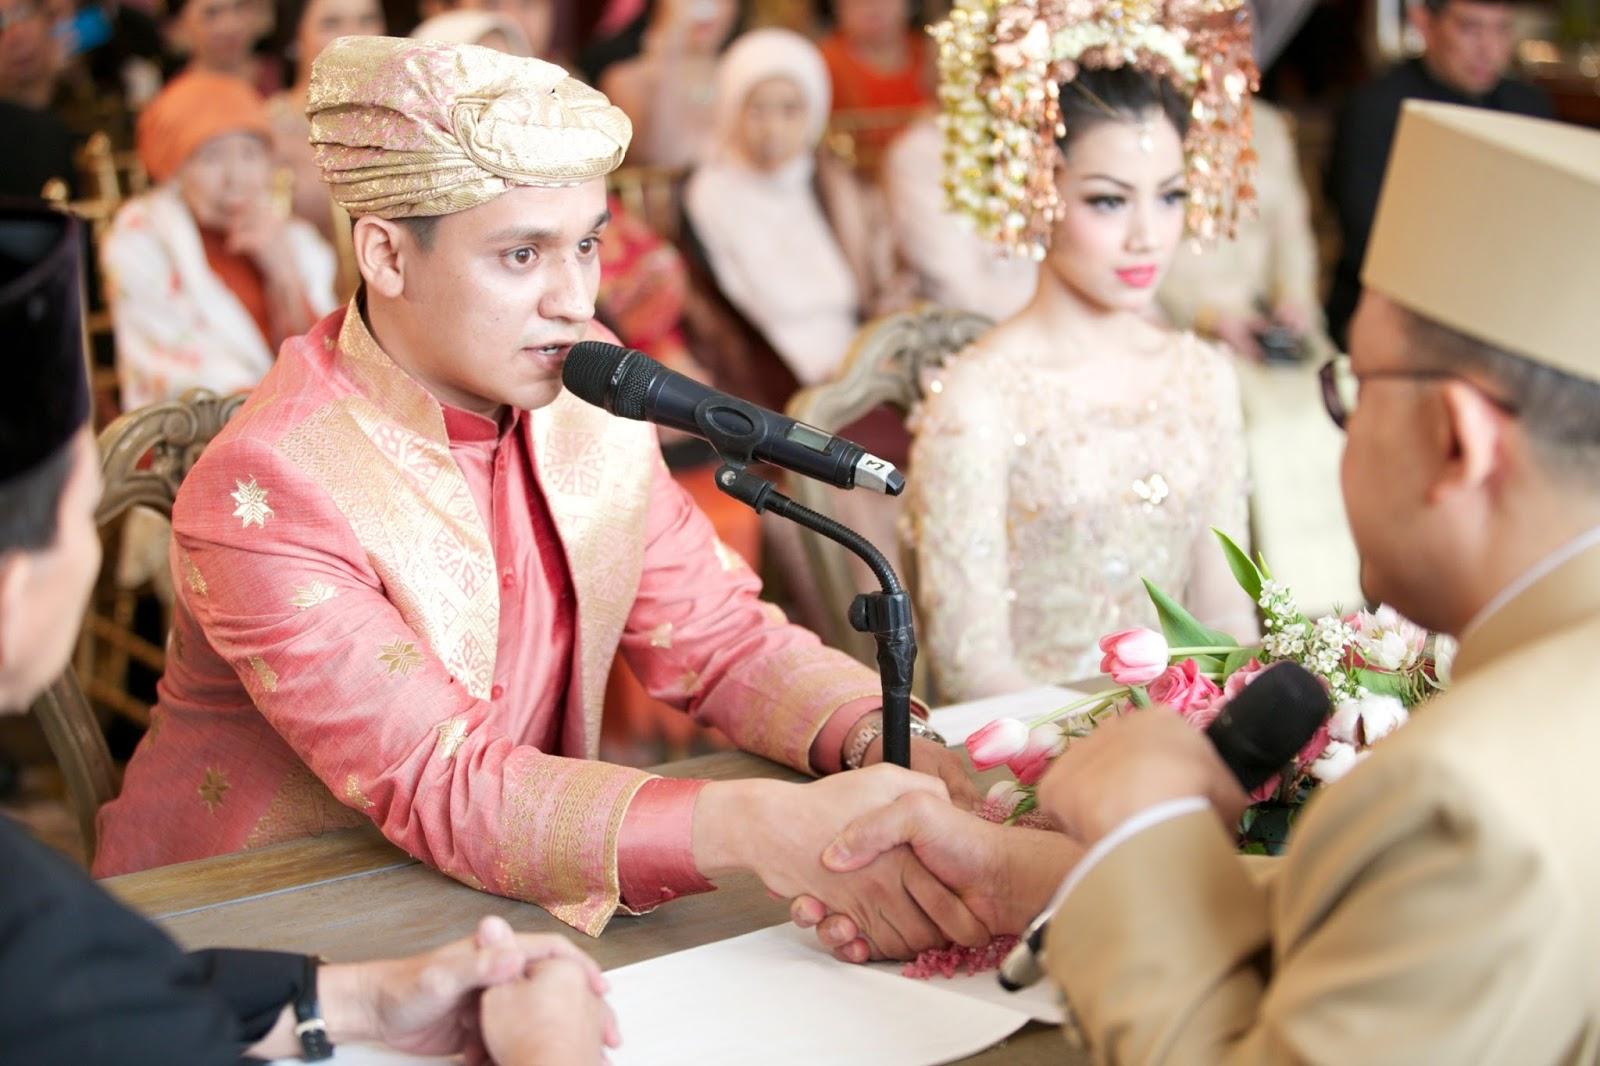 Alinda39s Blog Prosesi Pernikahan Adat Minang QuotBaralek Gadangquot